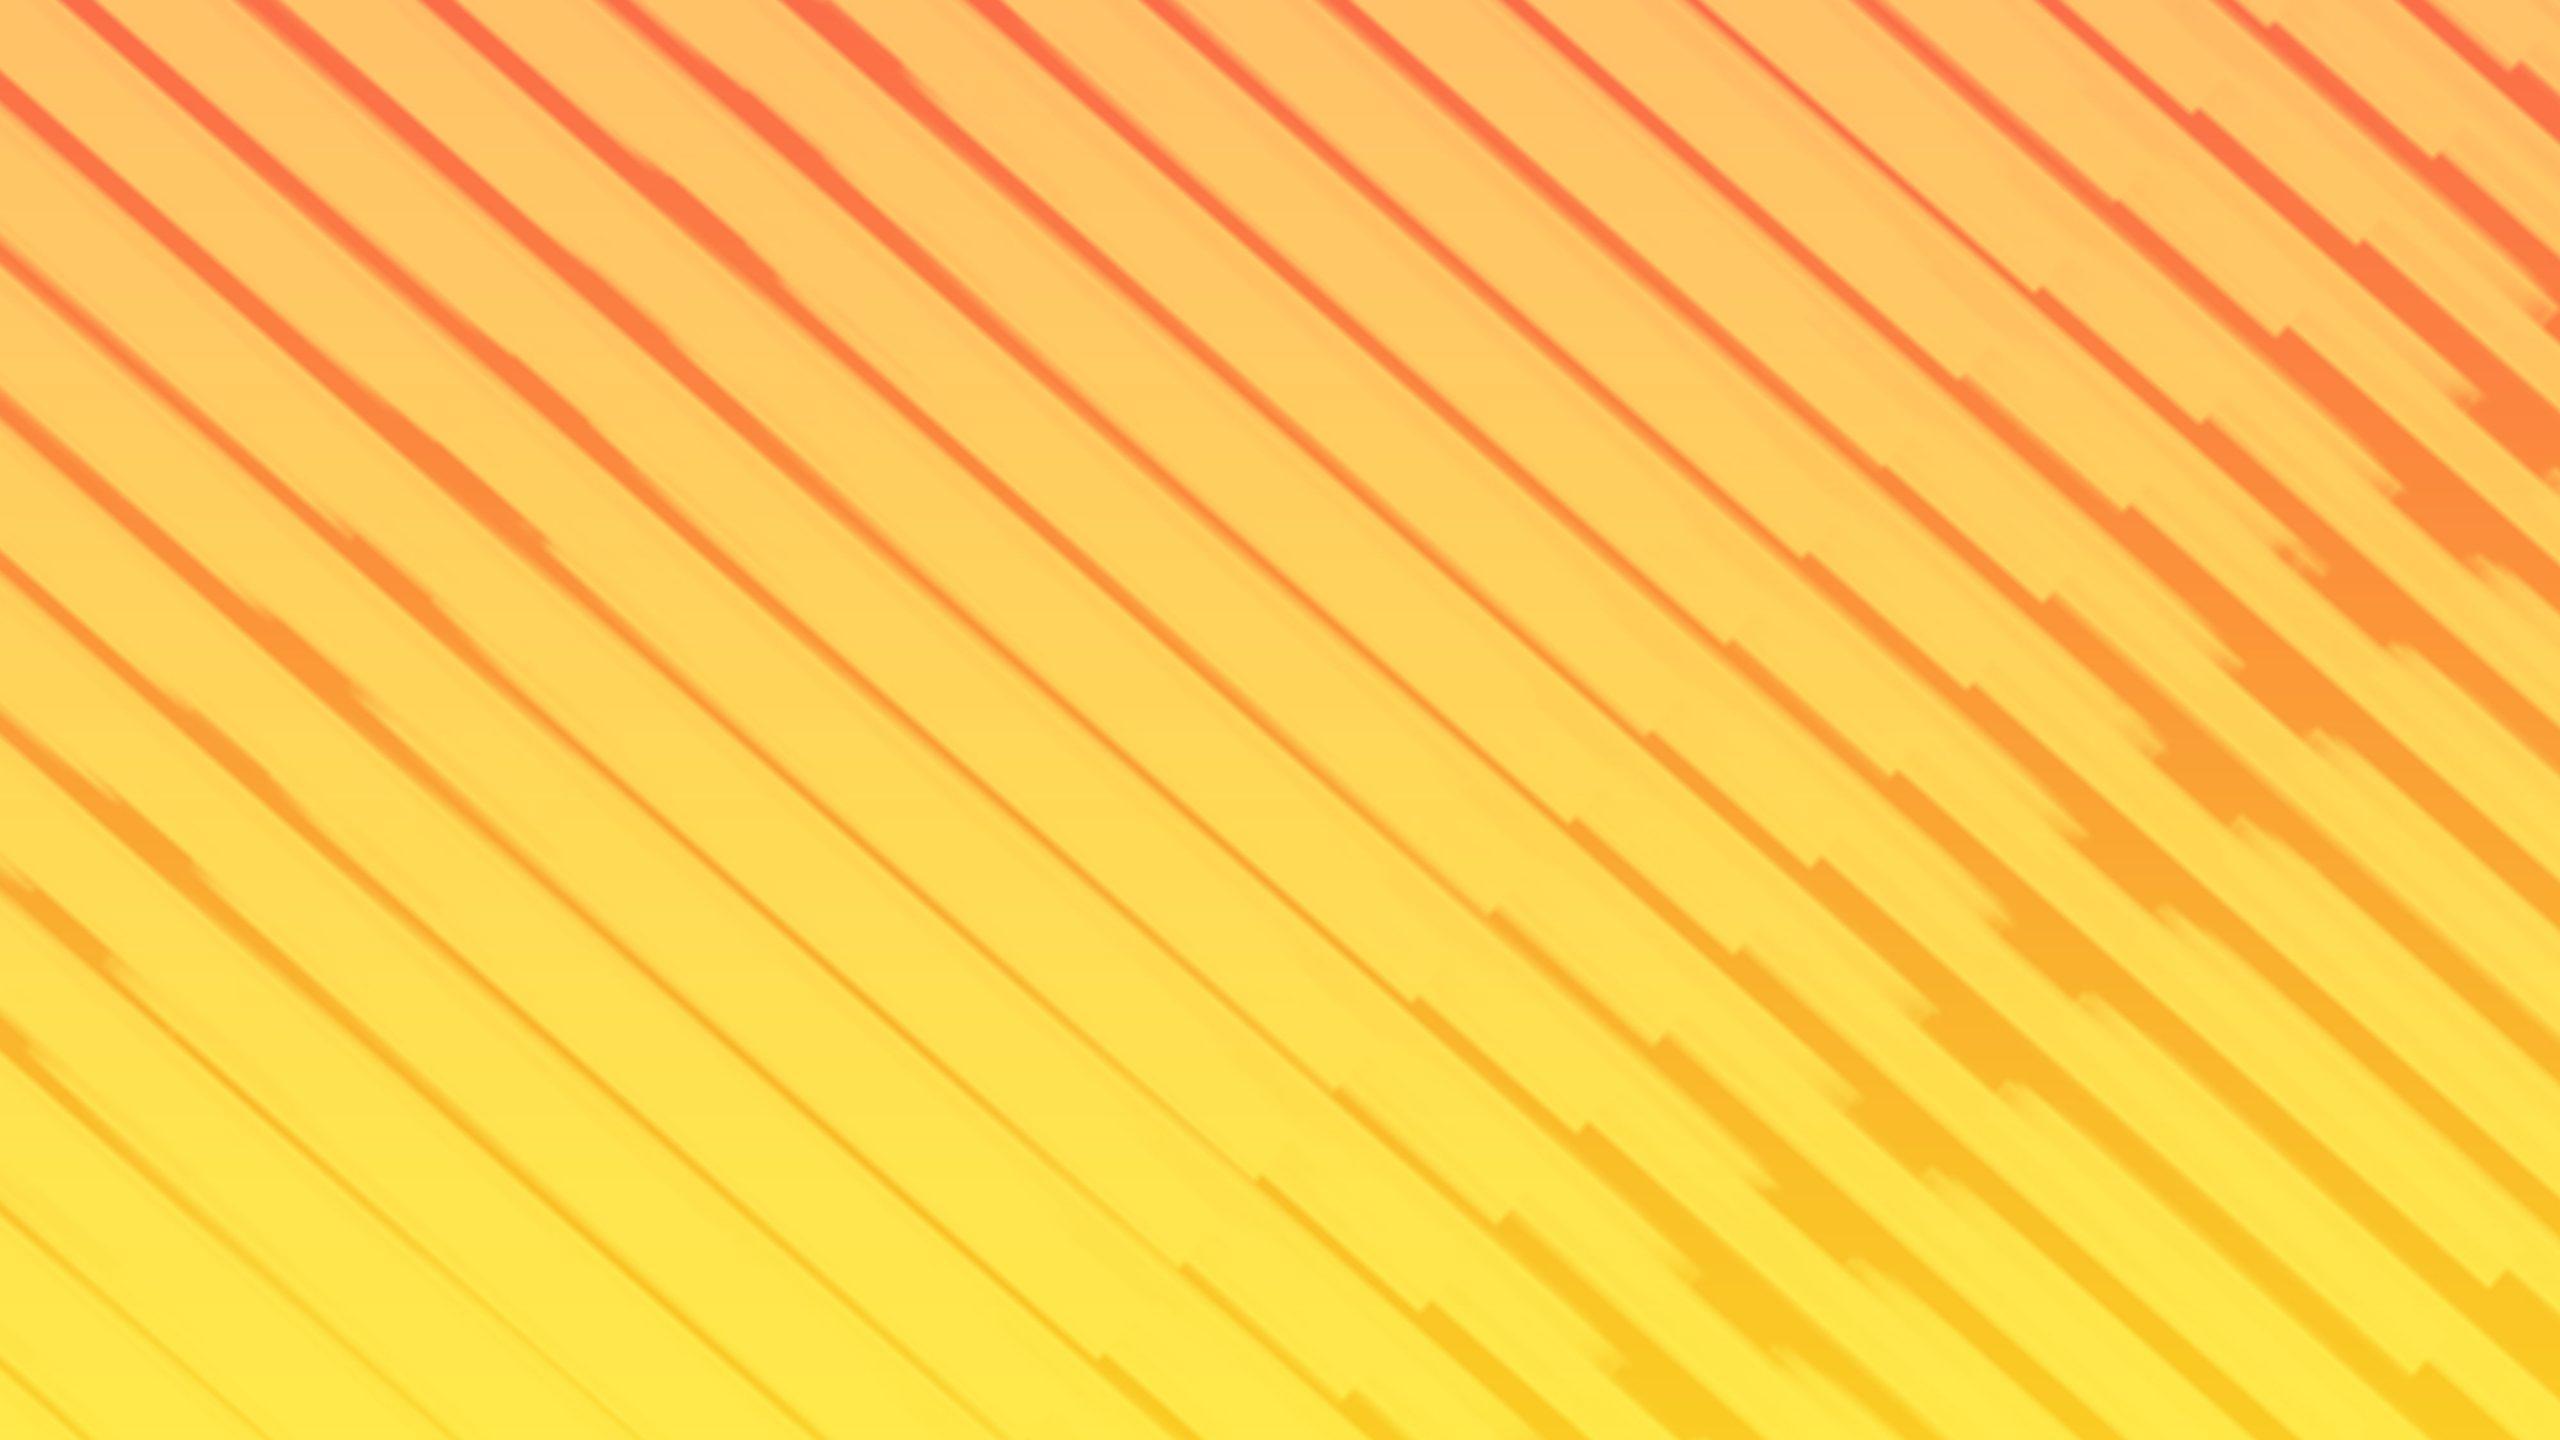 orange yellow pattern background